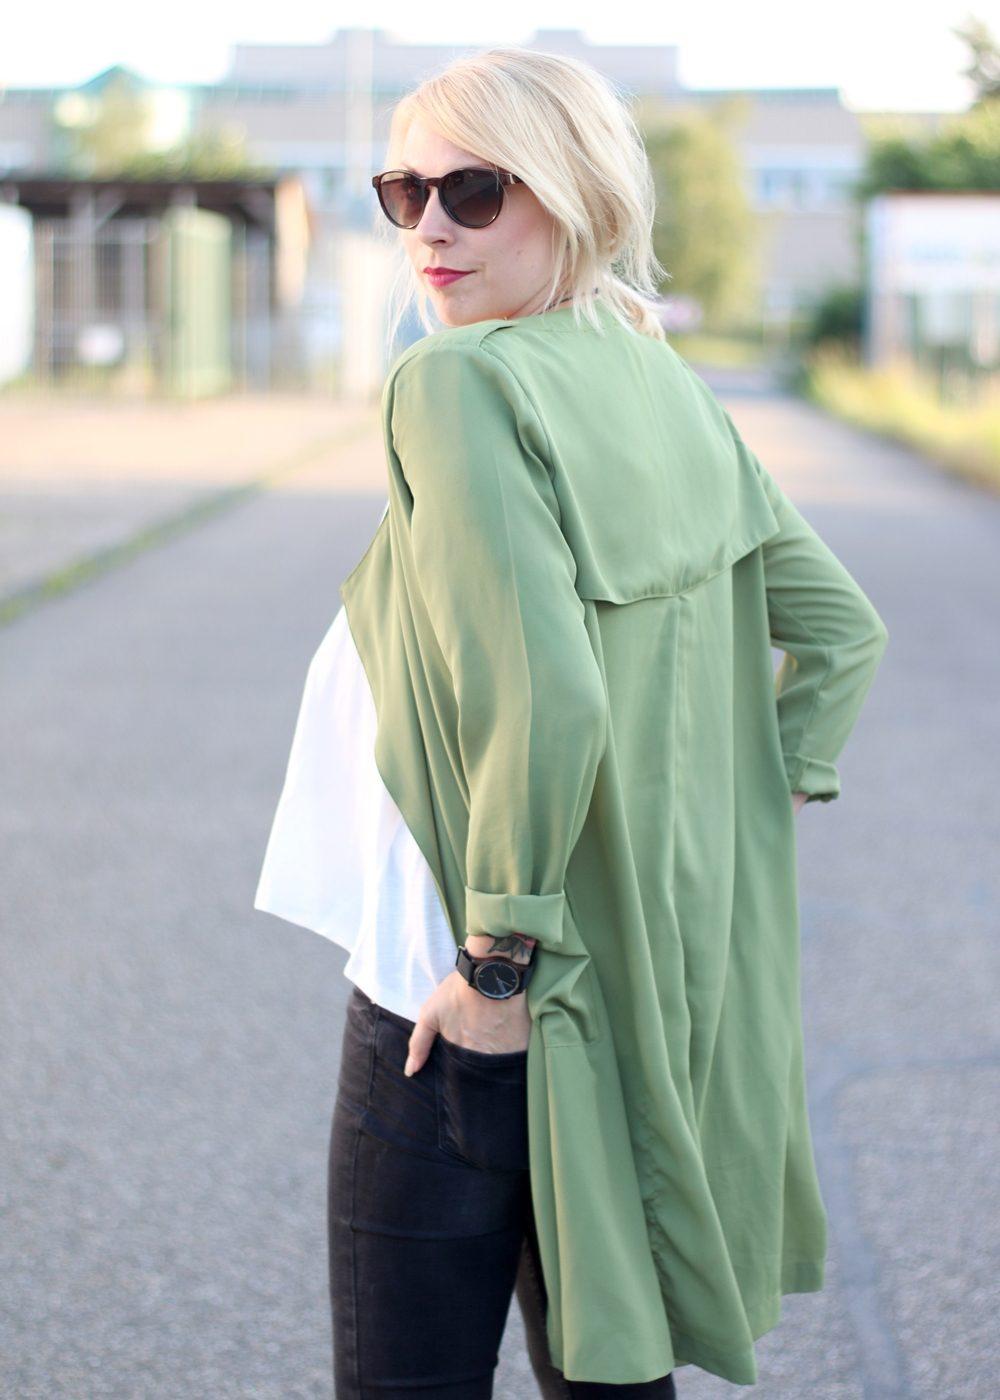 Fashionbloggerin Karlsruhe Outfit Parka Nike Air Max Sonnenbrille (6)